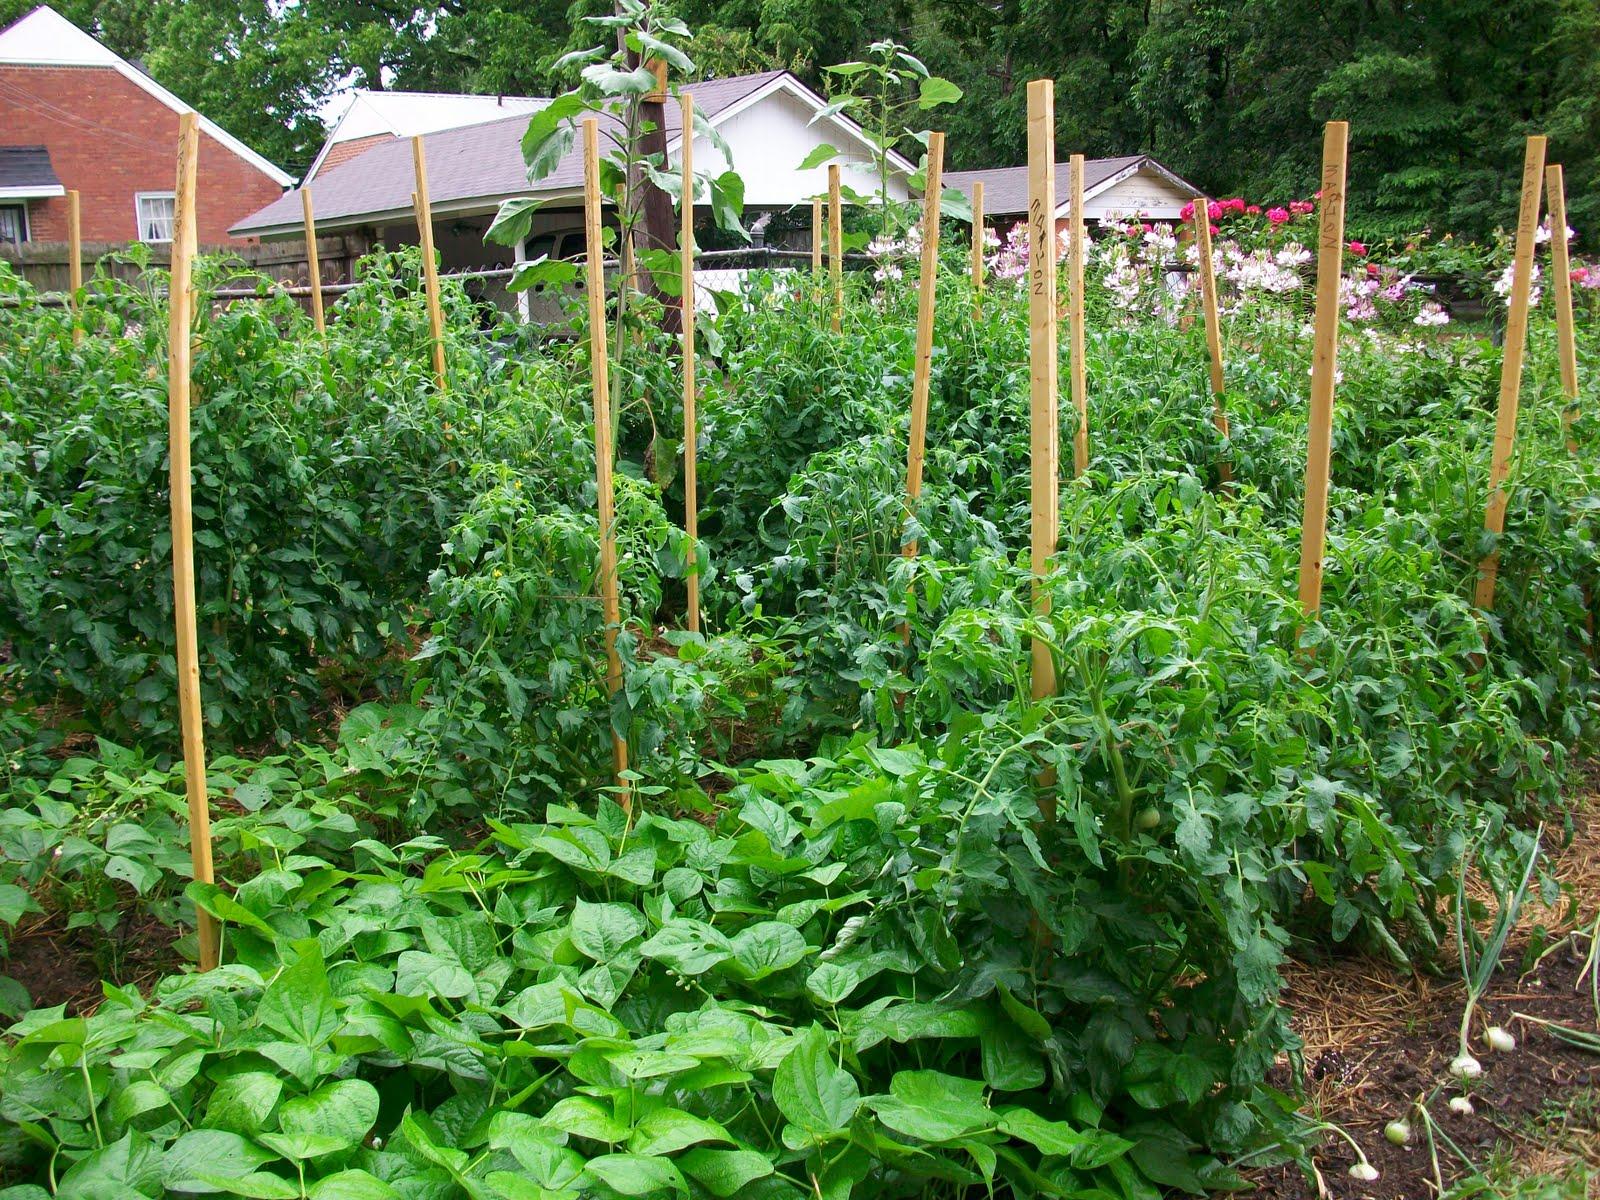 Nashville Farm Garden Craigslist Share The Knownledge